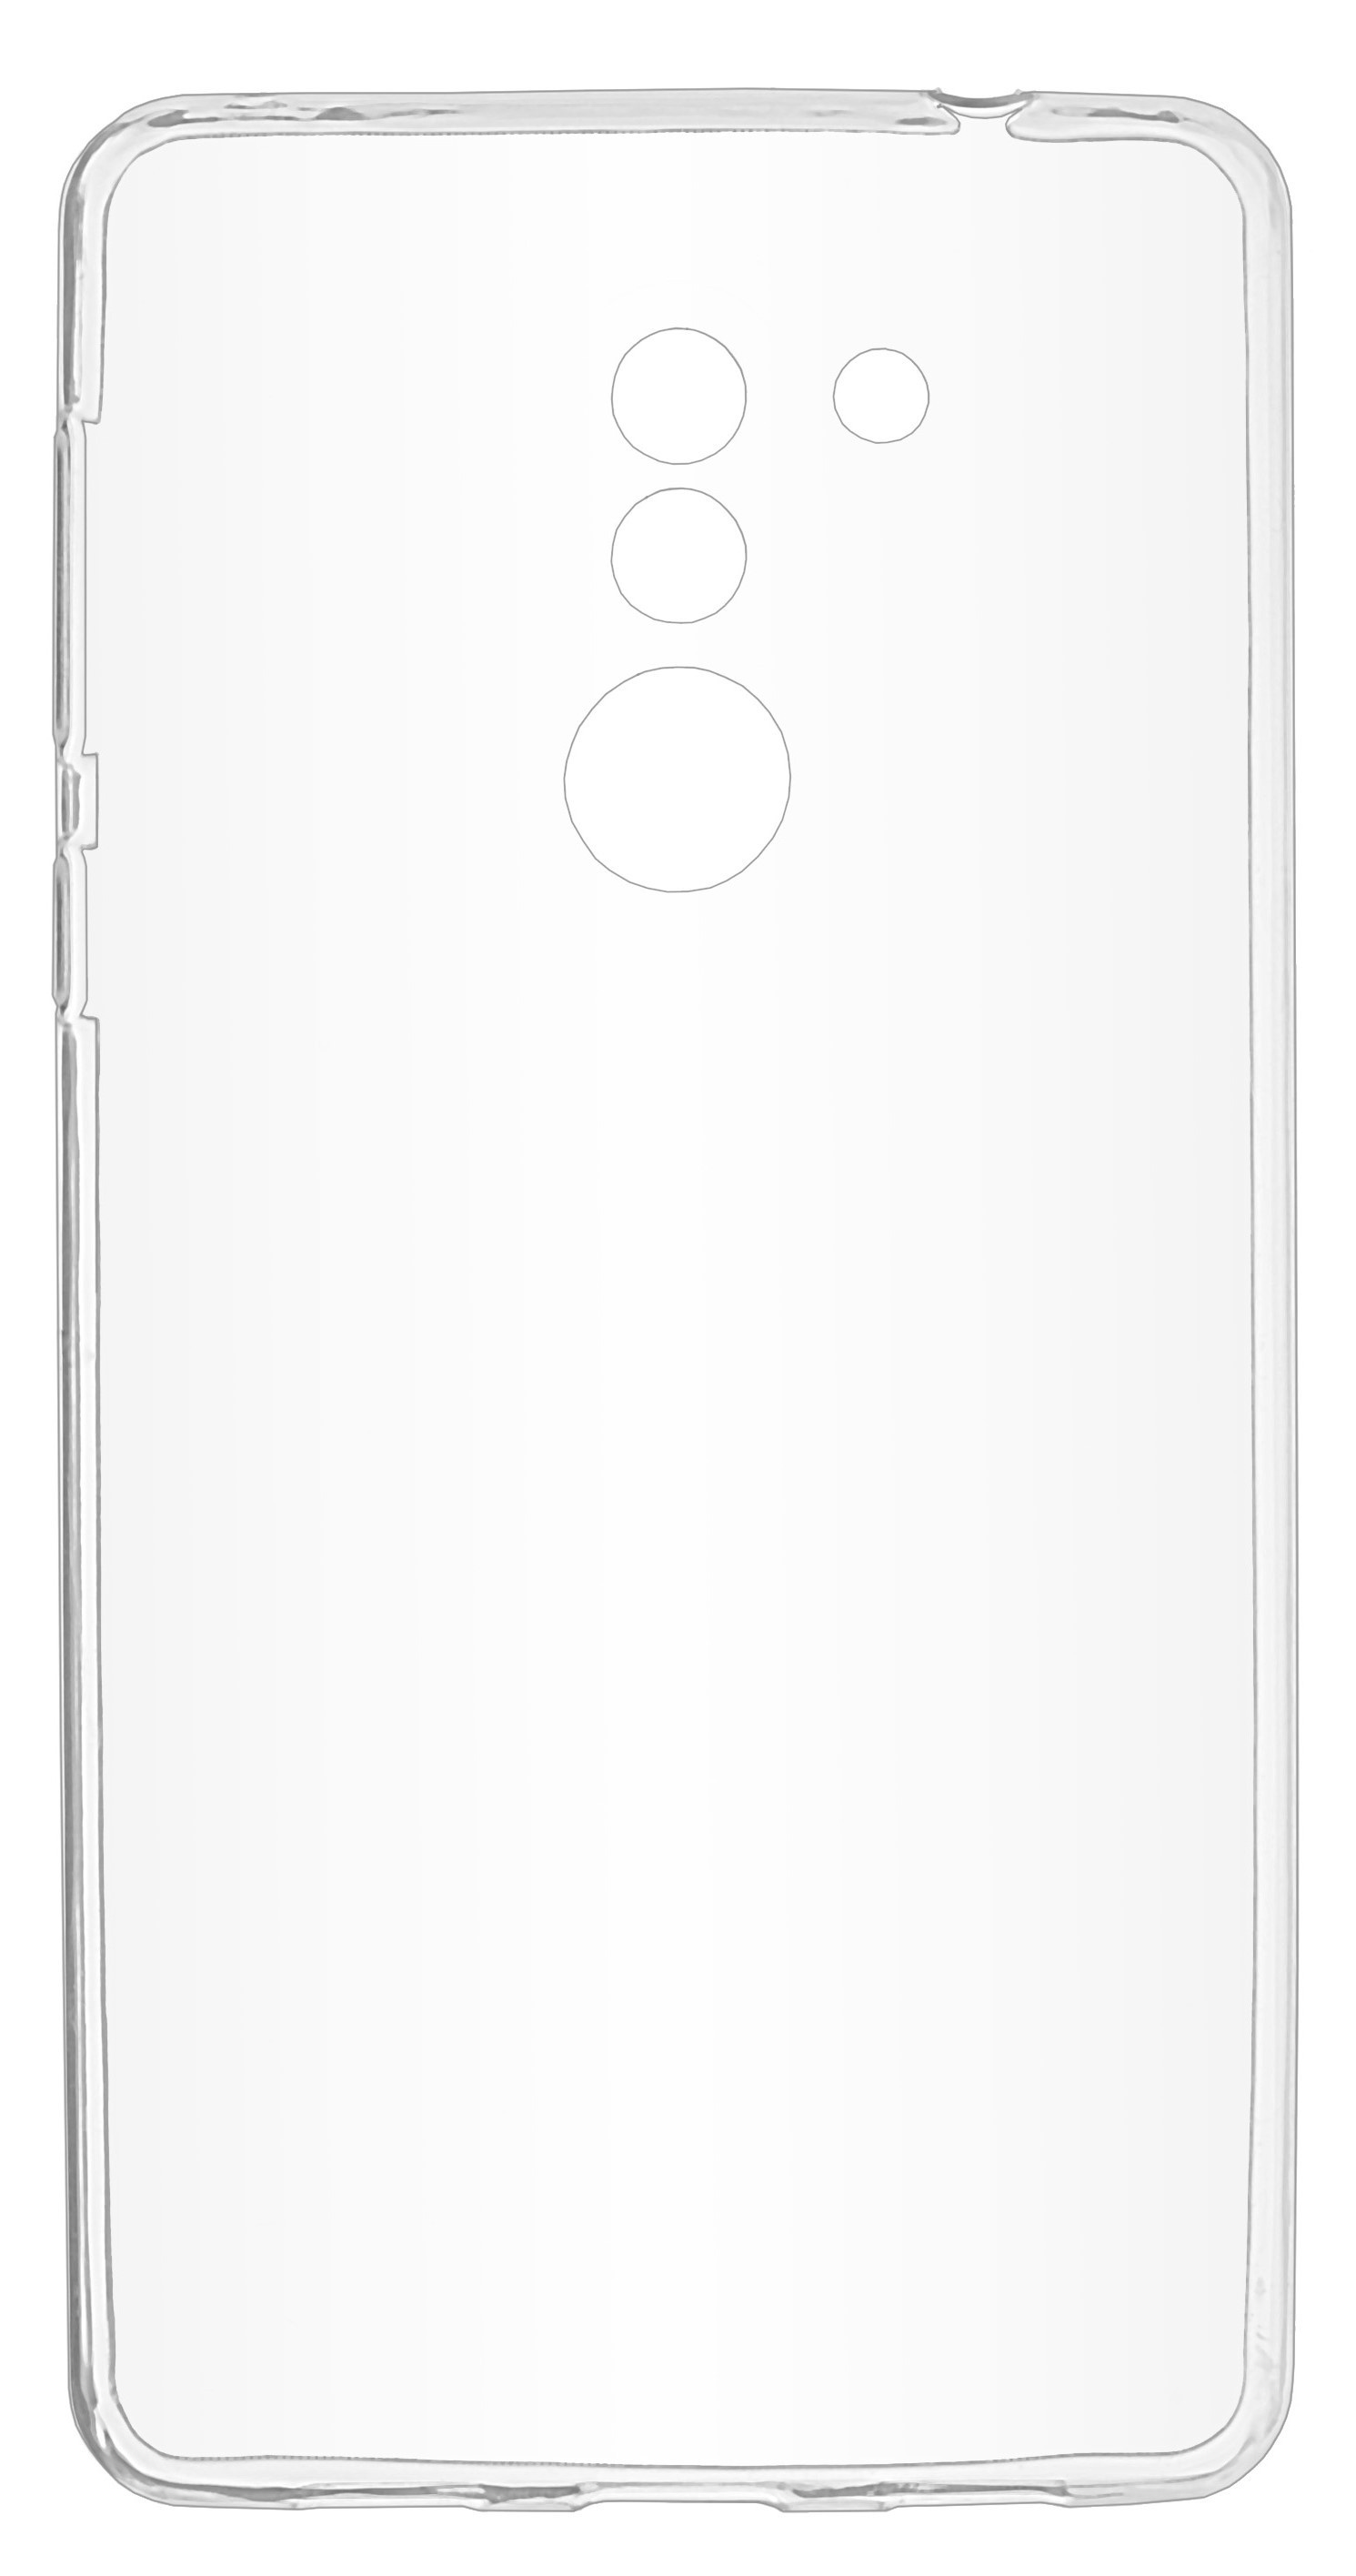 Чехол для сотового телефона skinBOX Slim Silicone, 4630042529519, прозрачный цена и фото